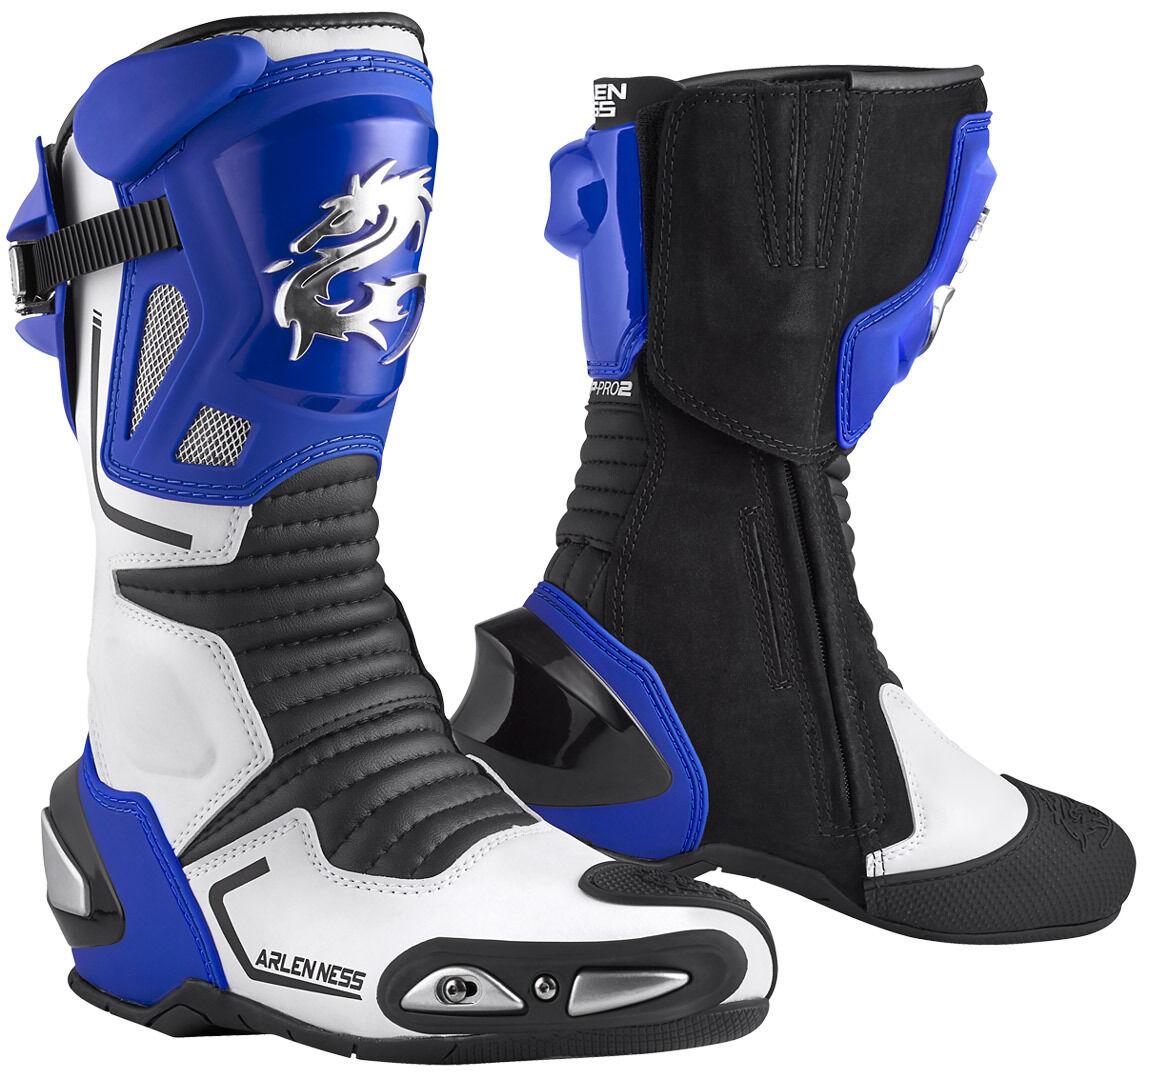 Arlen Ness Sugello Bottes de moto Noir Blanc Bleu taille : 44